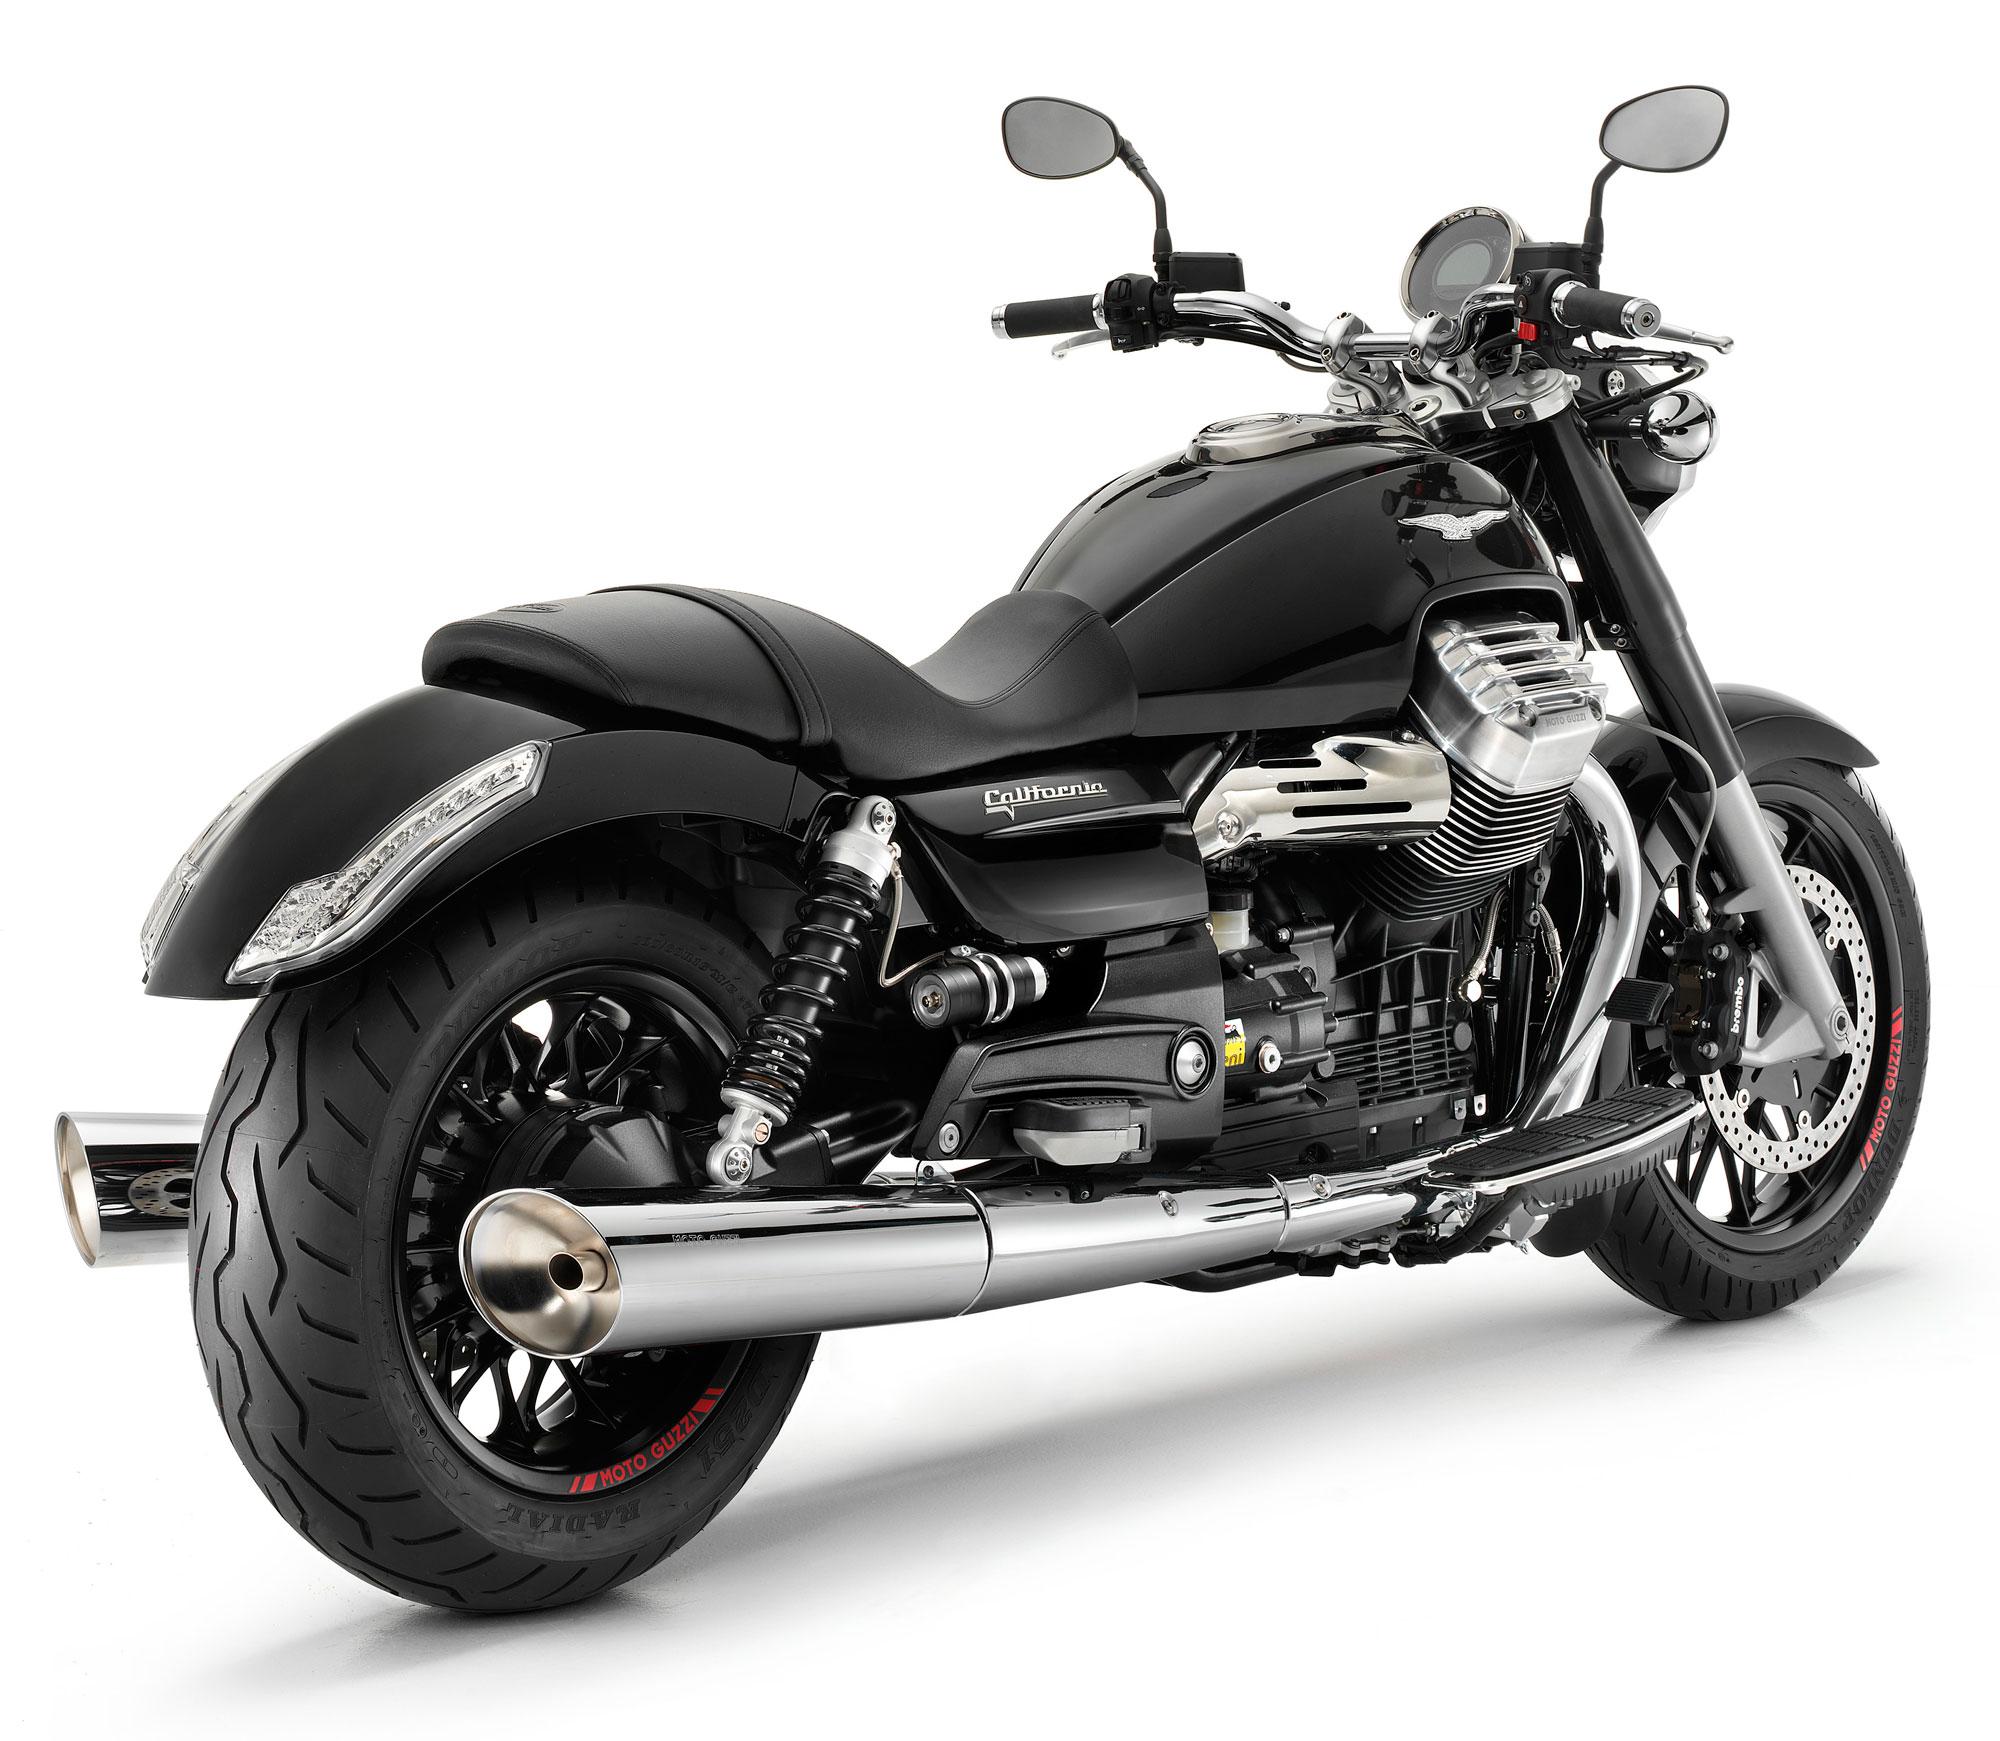 moto guzzi california 1400 custom specs 2012 2013 autoevolution. Black Bedroom Furniture Sets. Home Design Ideas